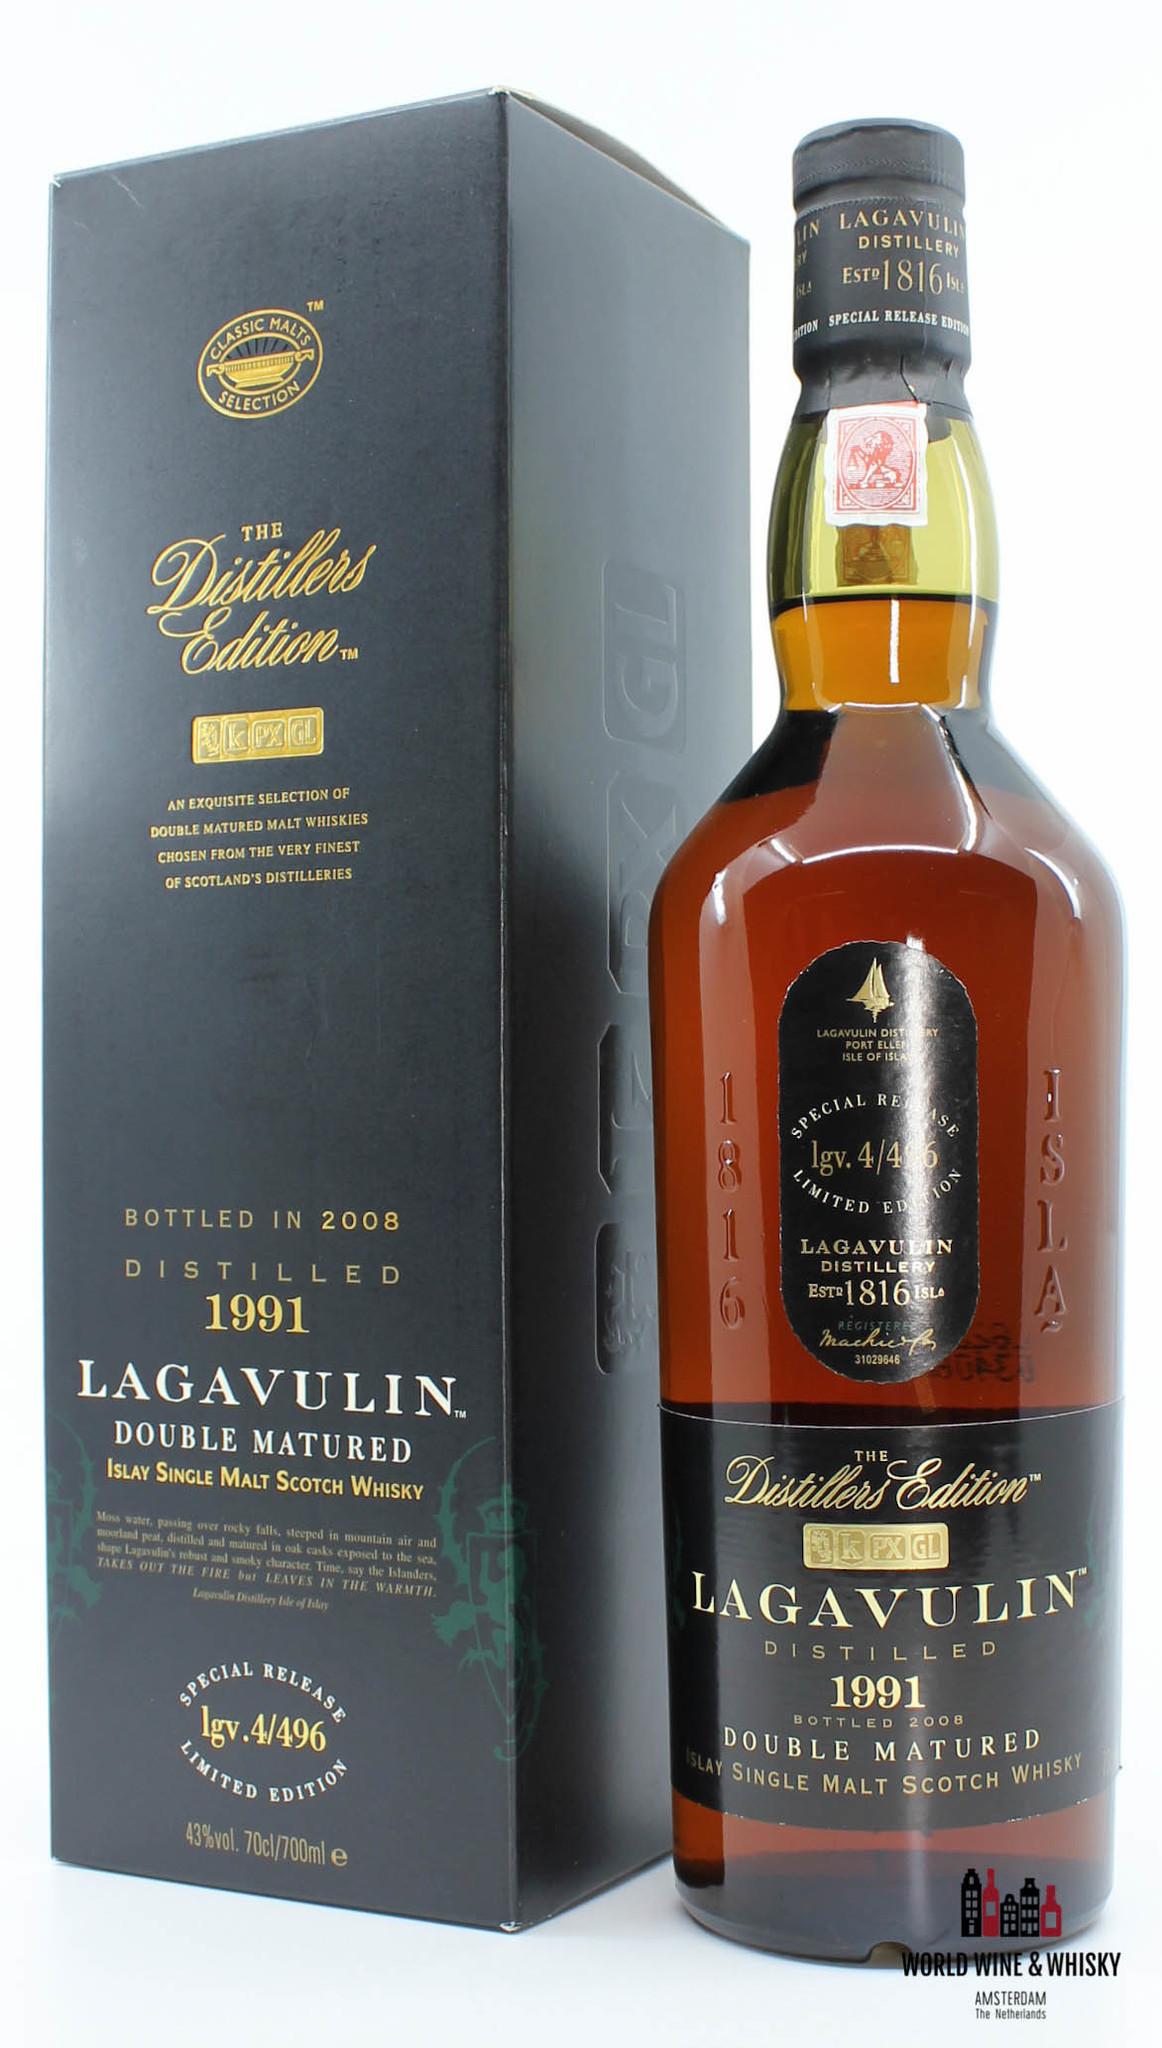 Lagavulin Lagavulin 17 Years Old 1991 2008 - The Distillers Edition - lgv.4/496 43% (700 ml)